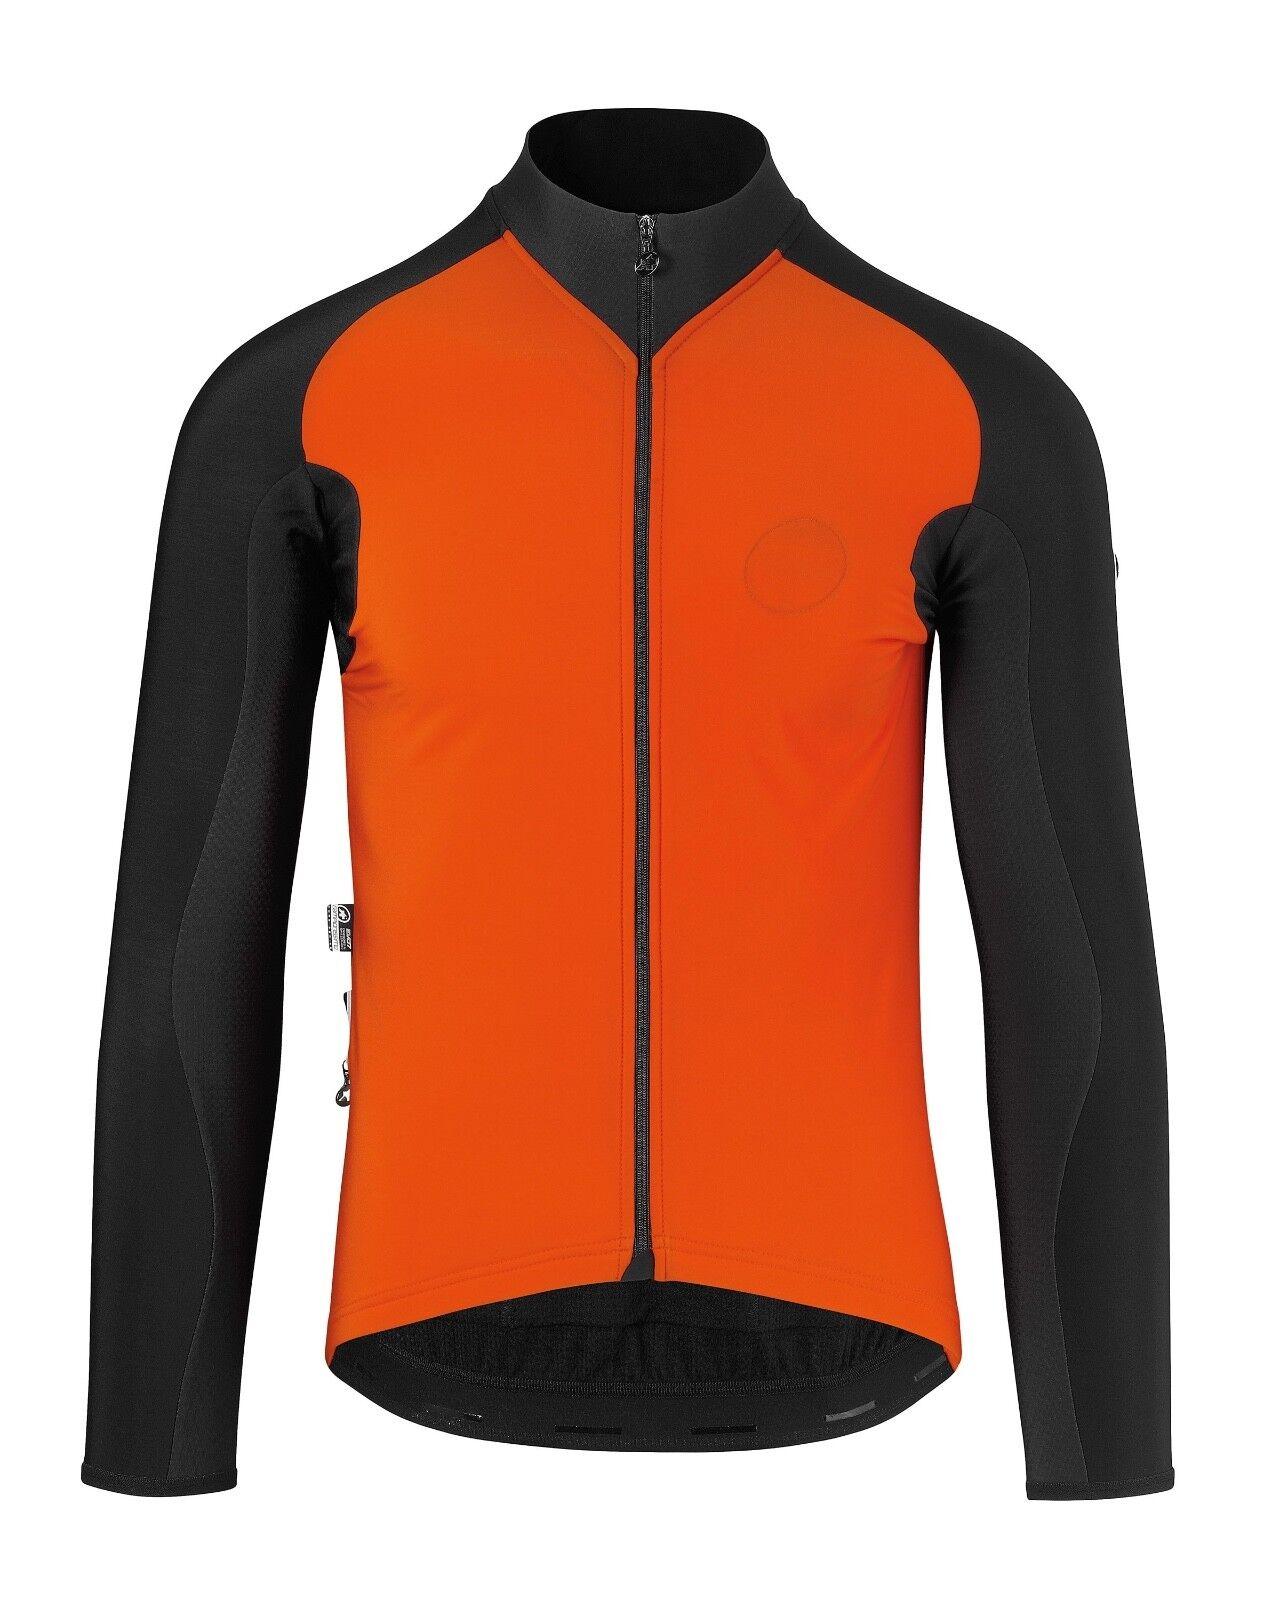 New ASSOS IJ.TIBURUJACKET_EVO7 MIDWEIGHT LONG-SLEEVED Jacket Größe Medium